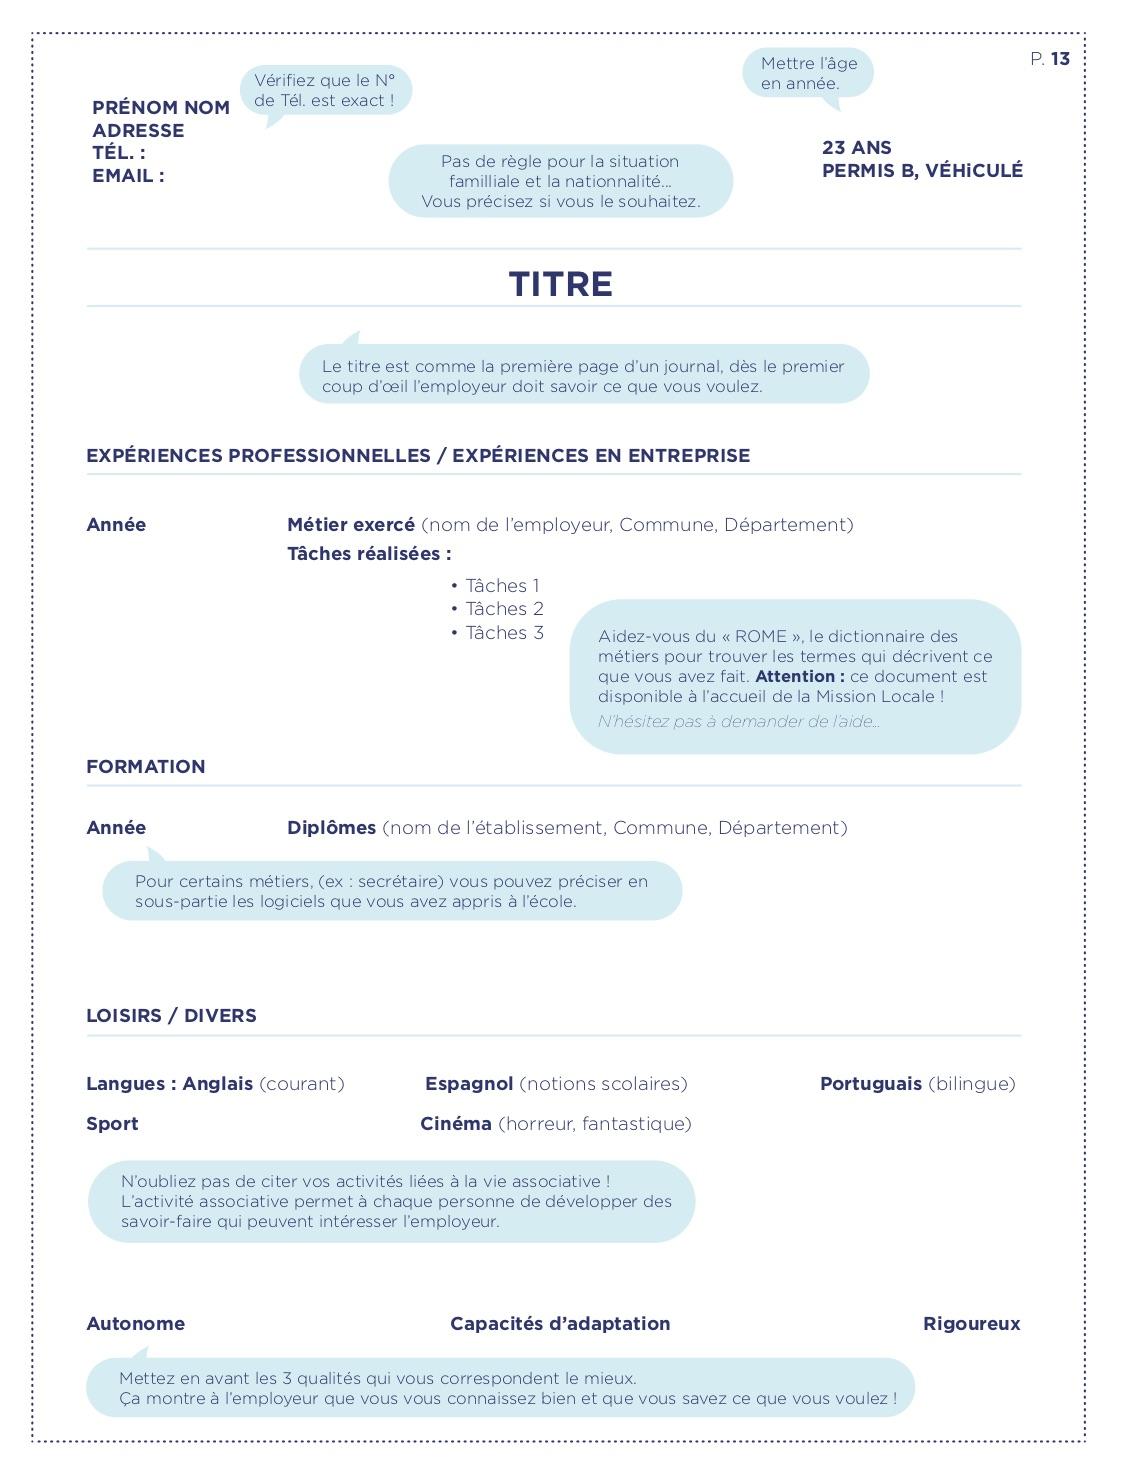 La forme du CV